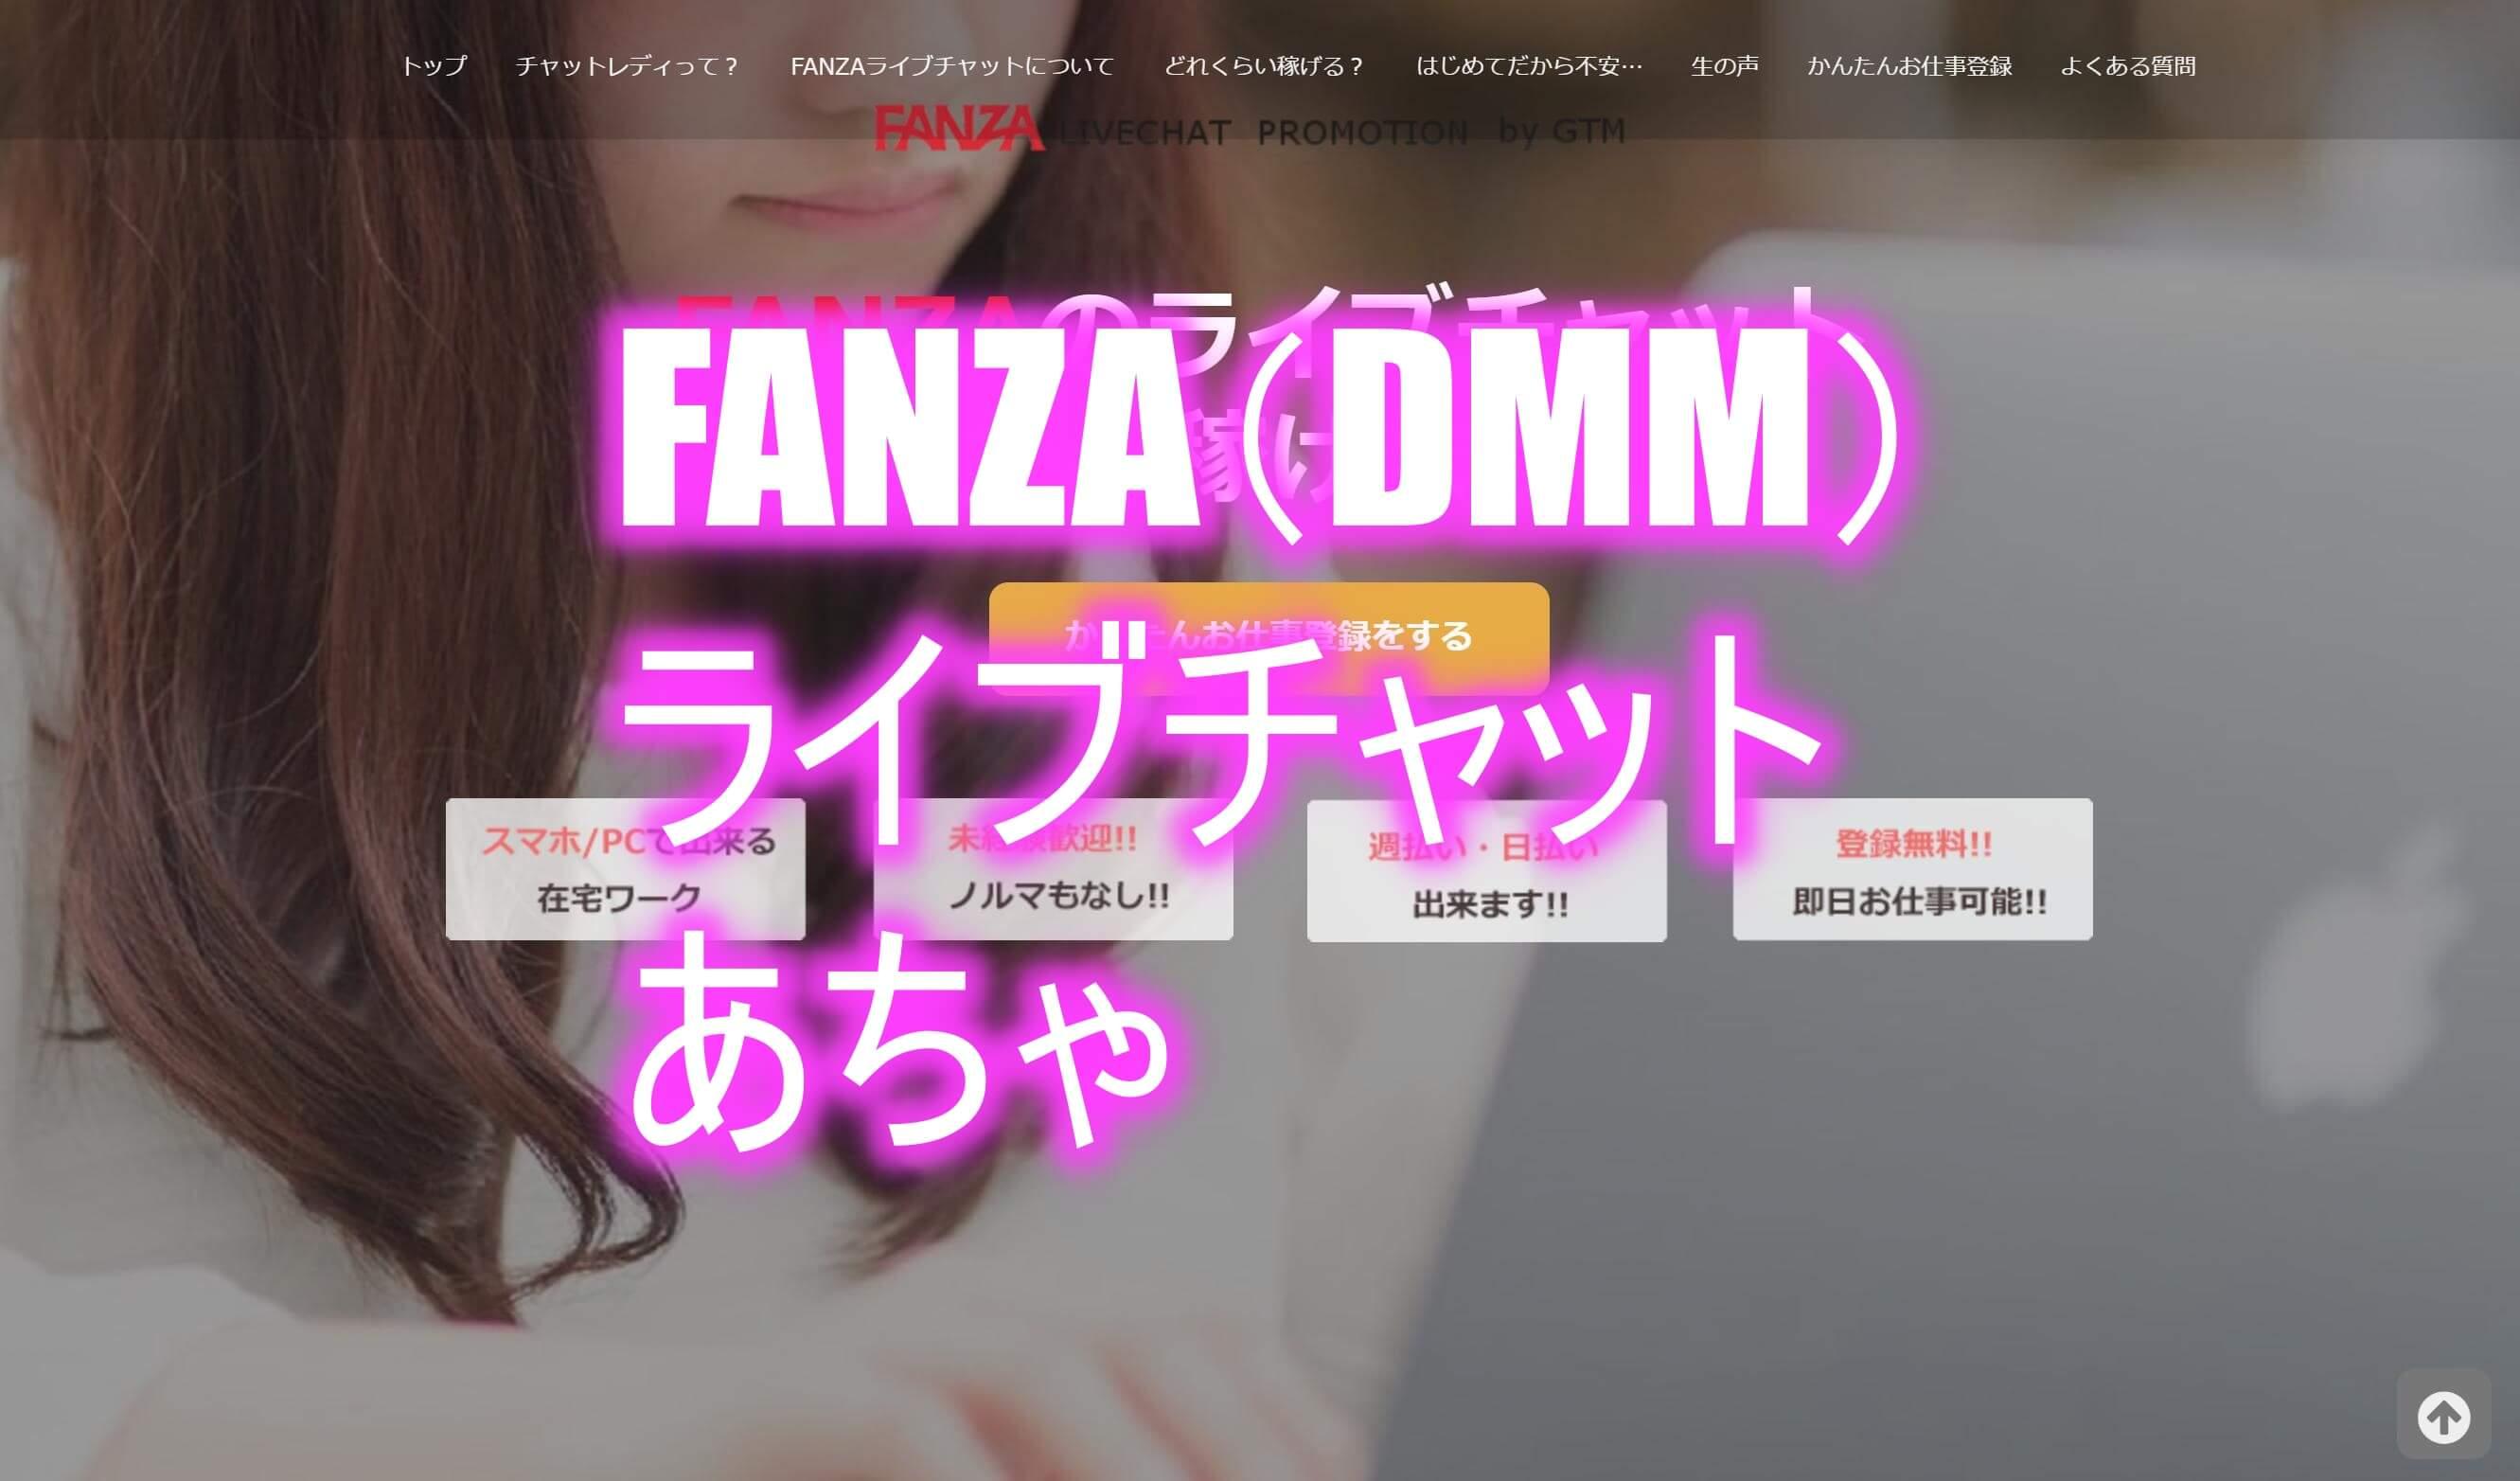 FANZA(DMM)ライブチャットあちゃ